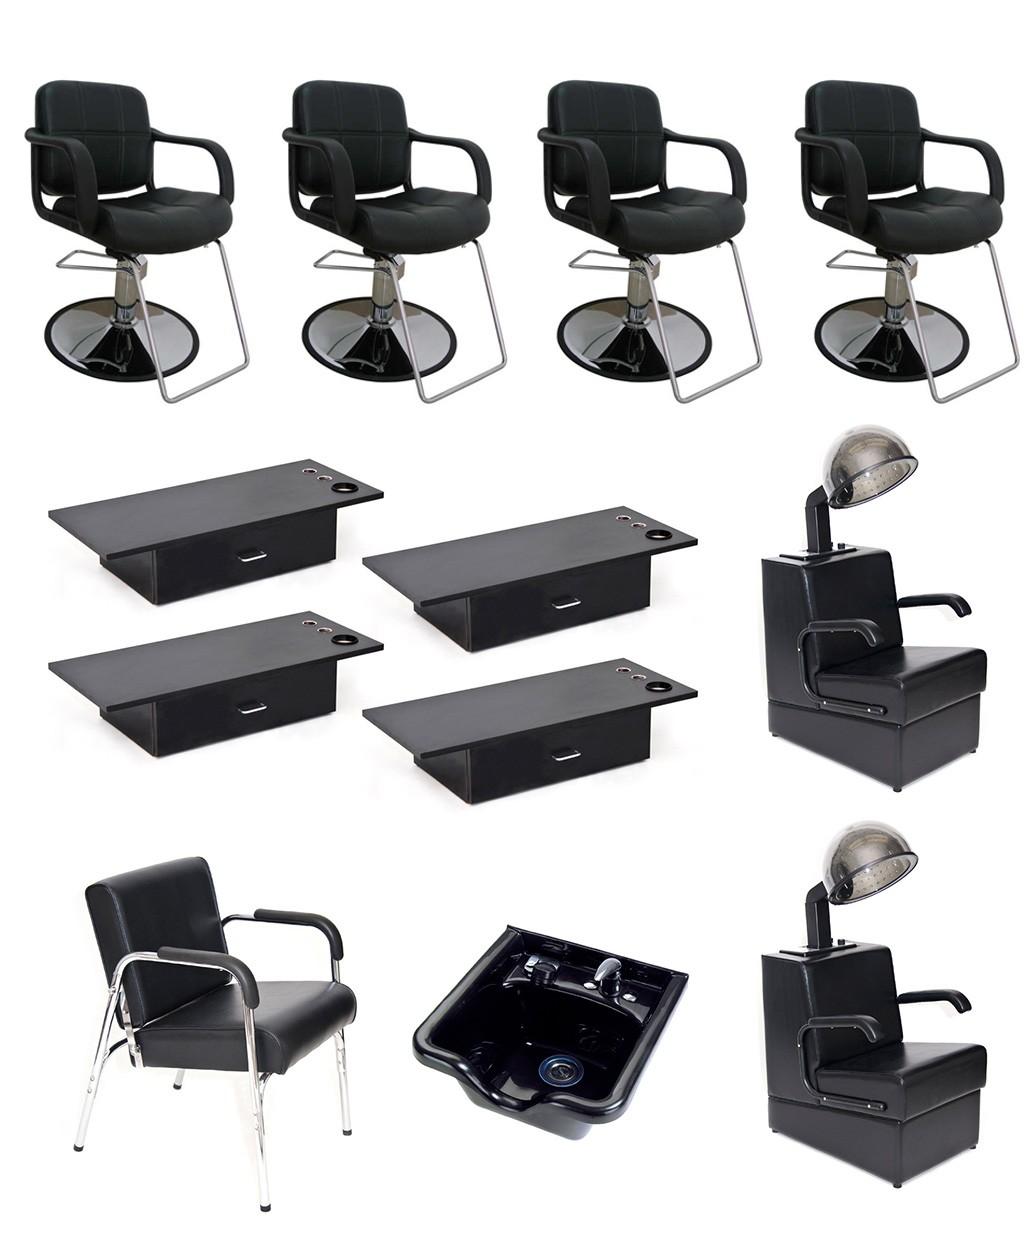 Atlsalonfurniture : atlsalonfurniture, Salon, Equipment, Atlanta, NaturalSalons